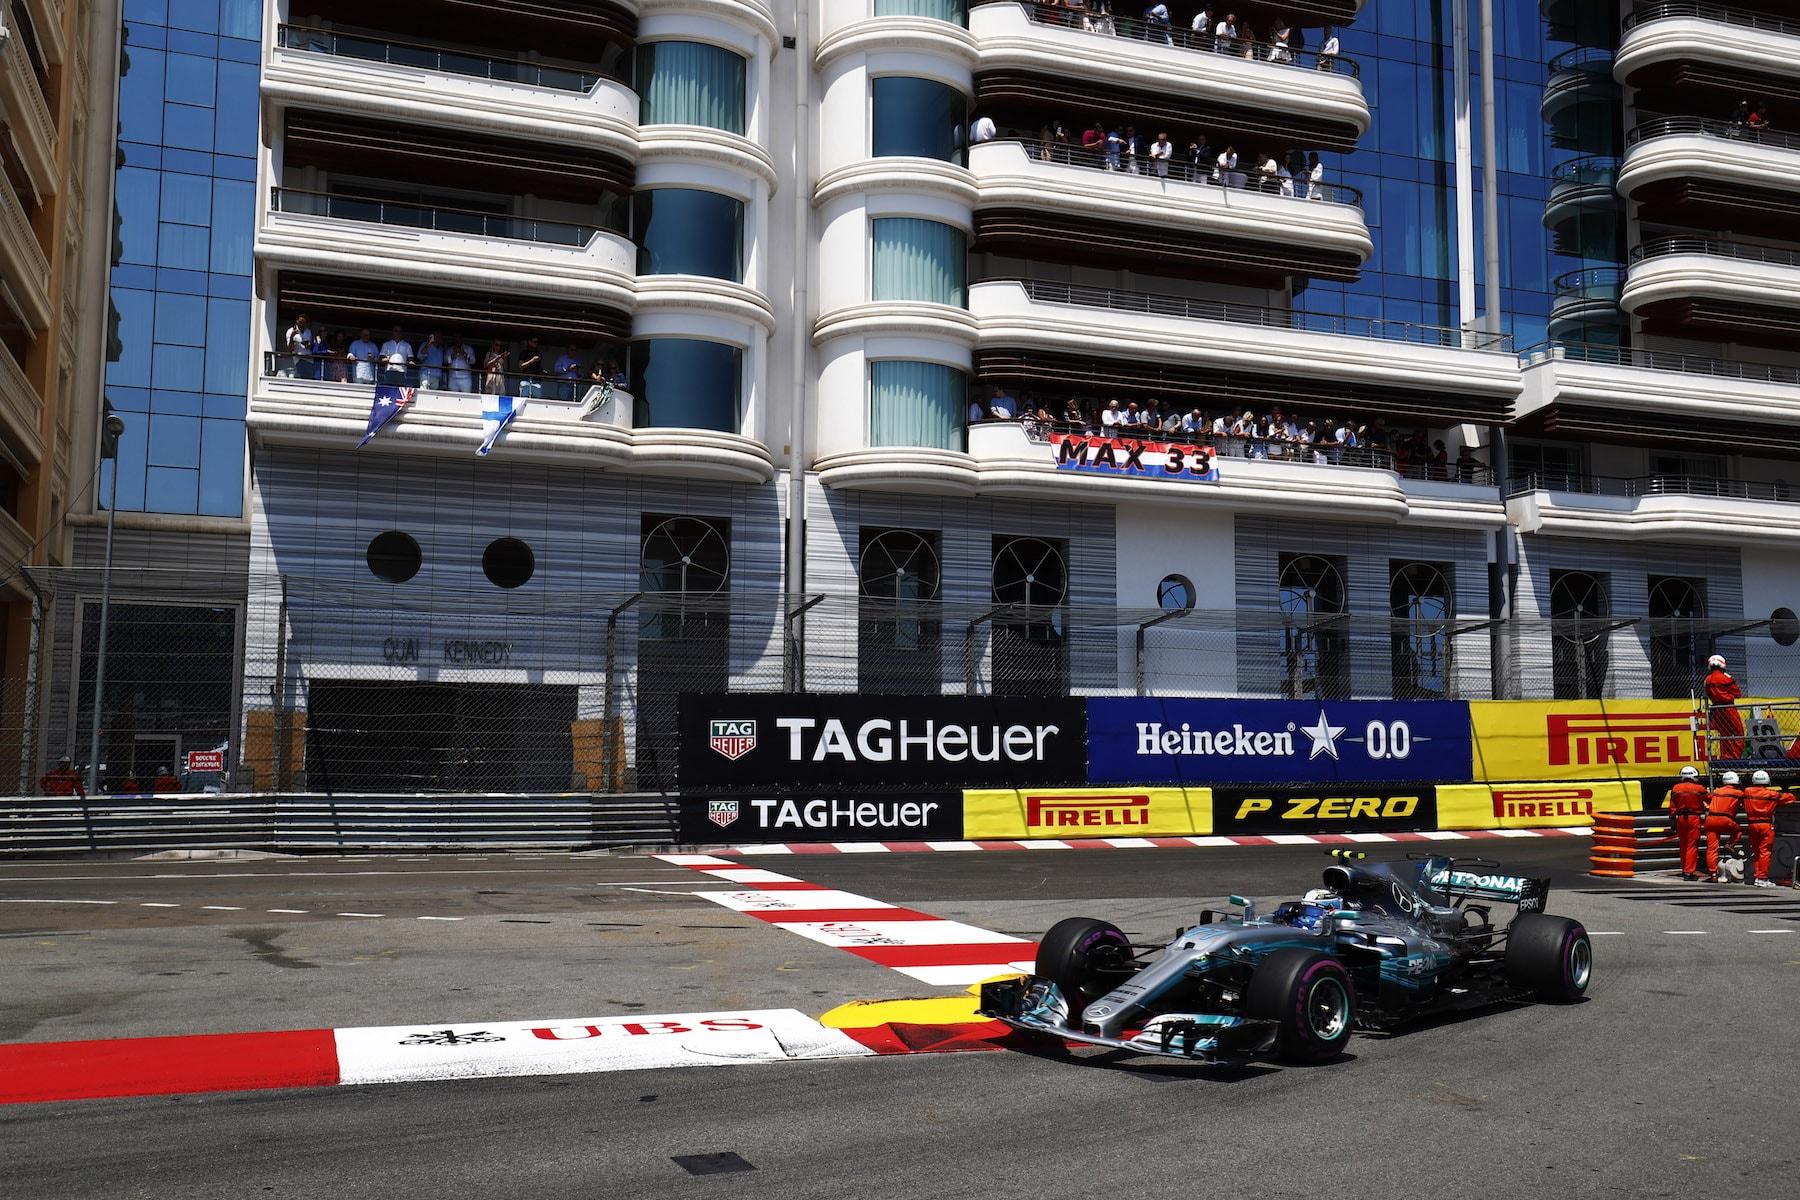 R 2017 Valtteri Bottas | Mercedes W08 | 2017 Monaco GP P4 1 copy.jpg